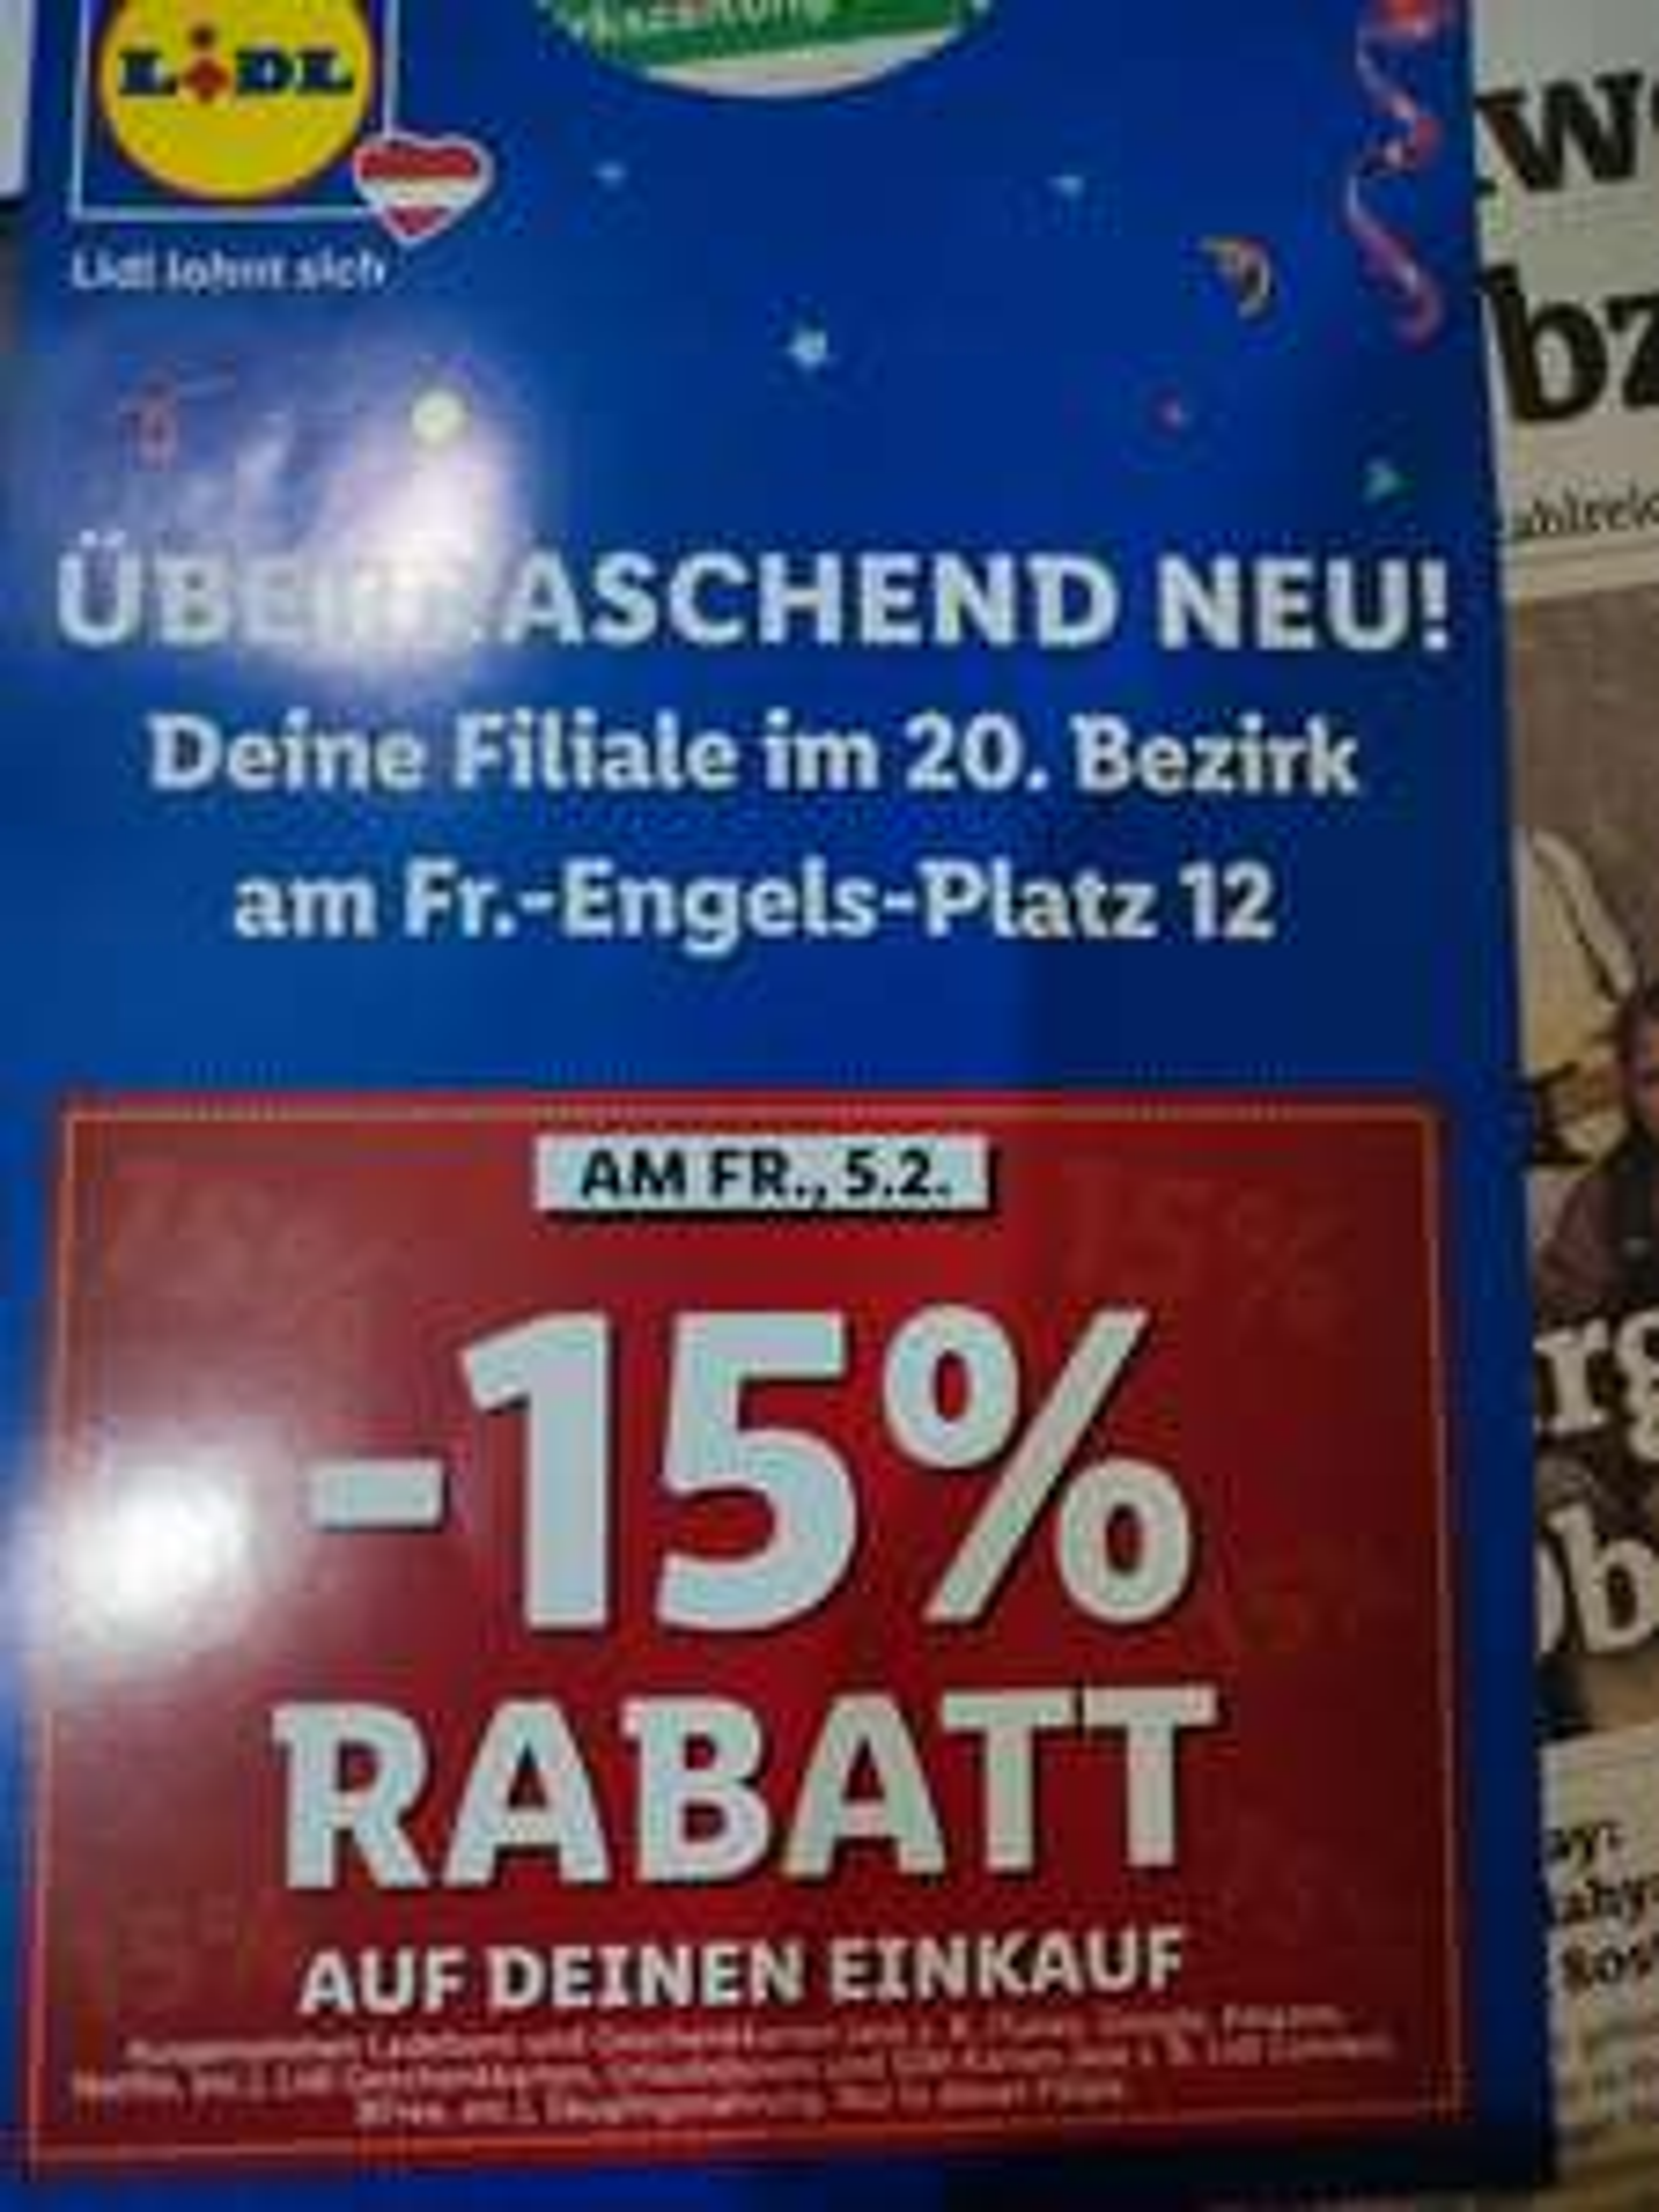 [Lidl] 15% Rabatt 1200 Wien Fr.-Engels-Platz 12